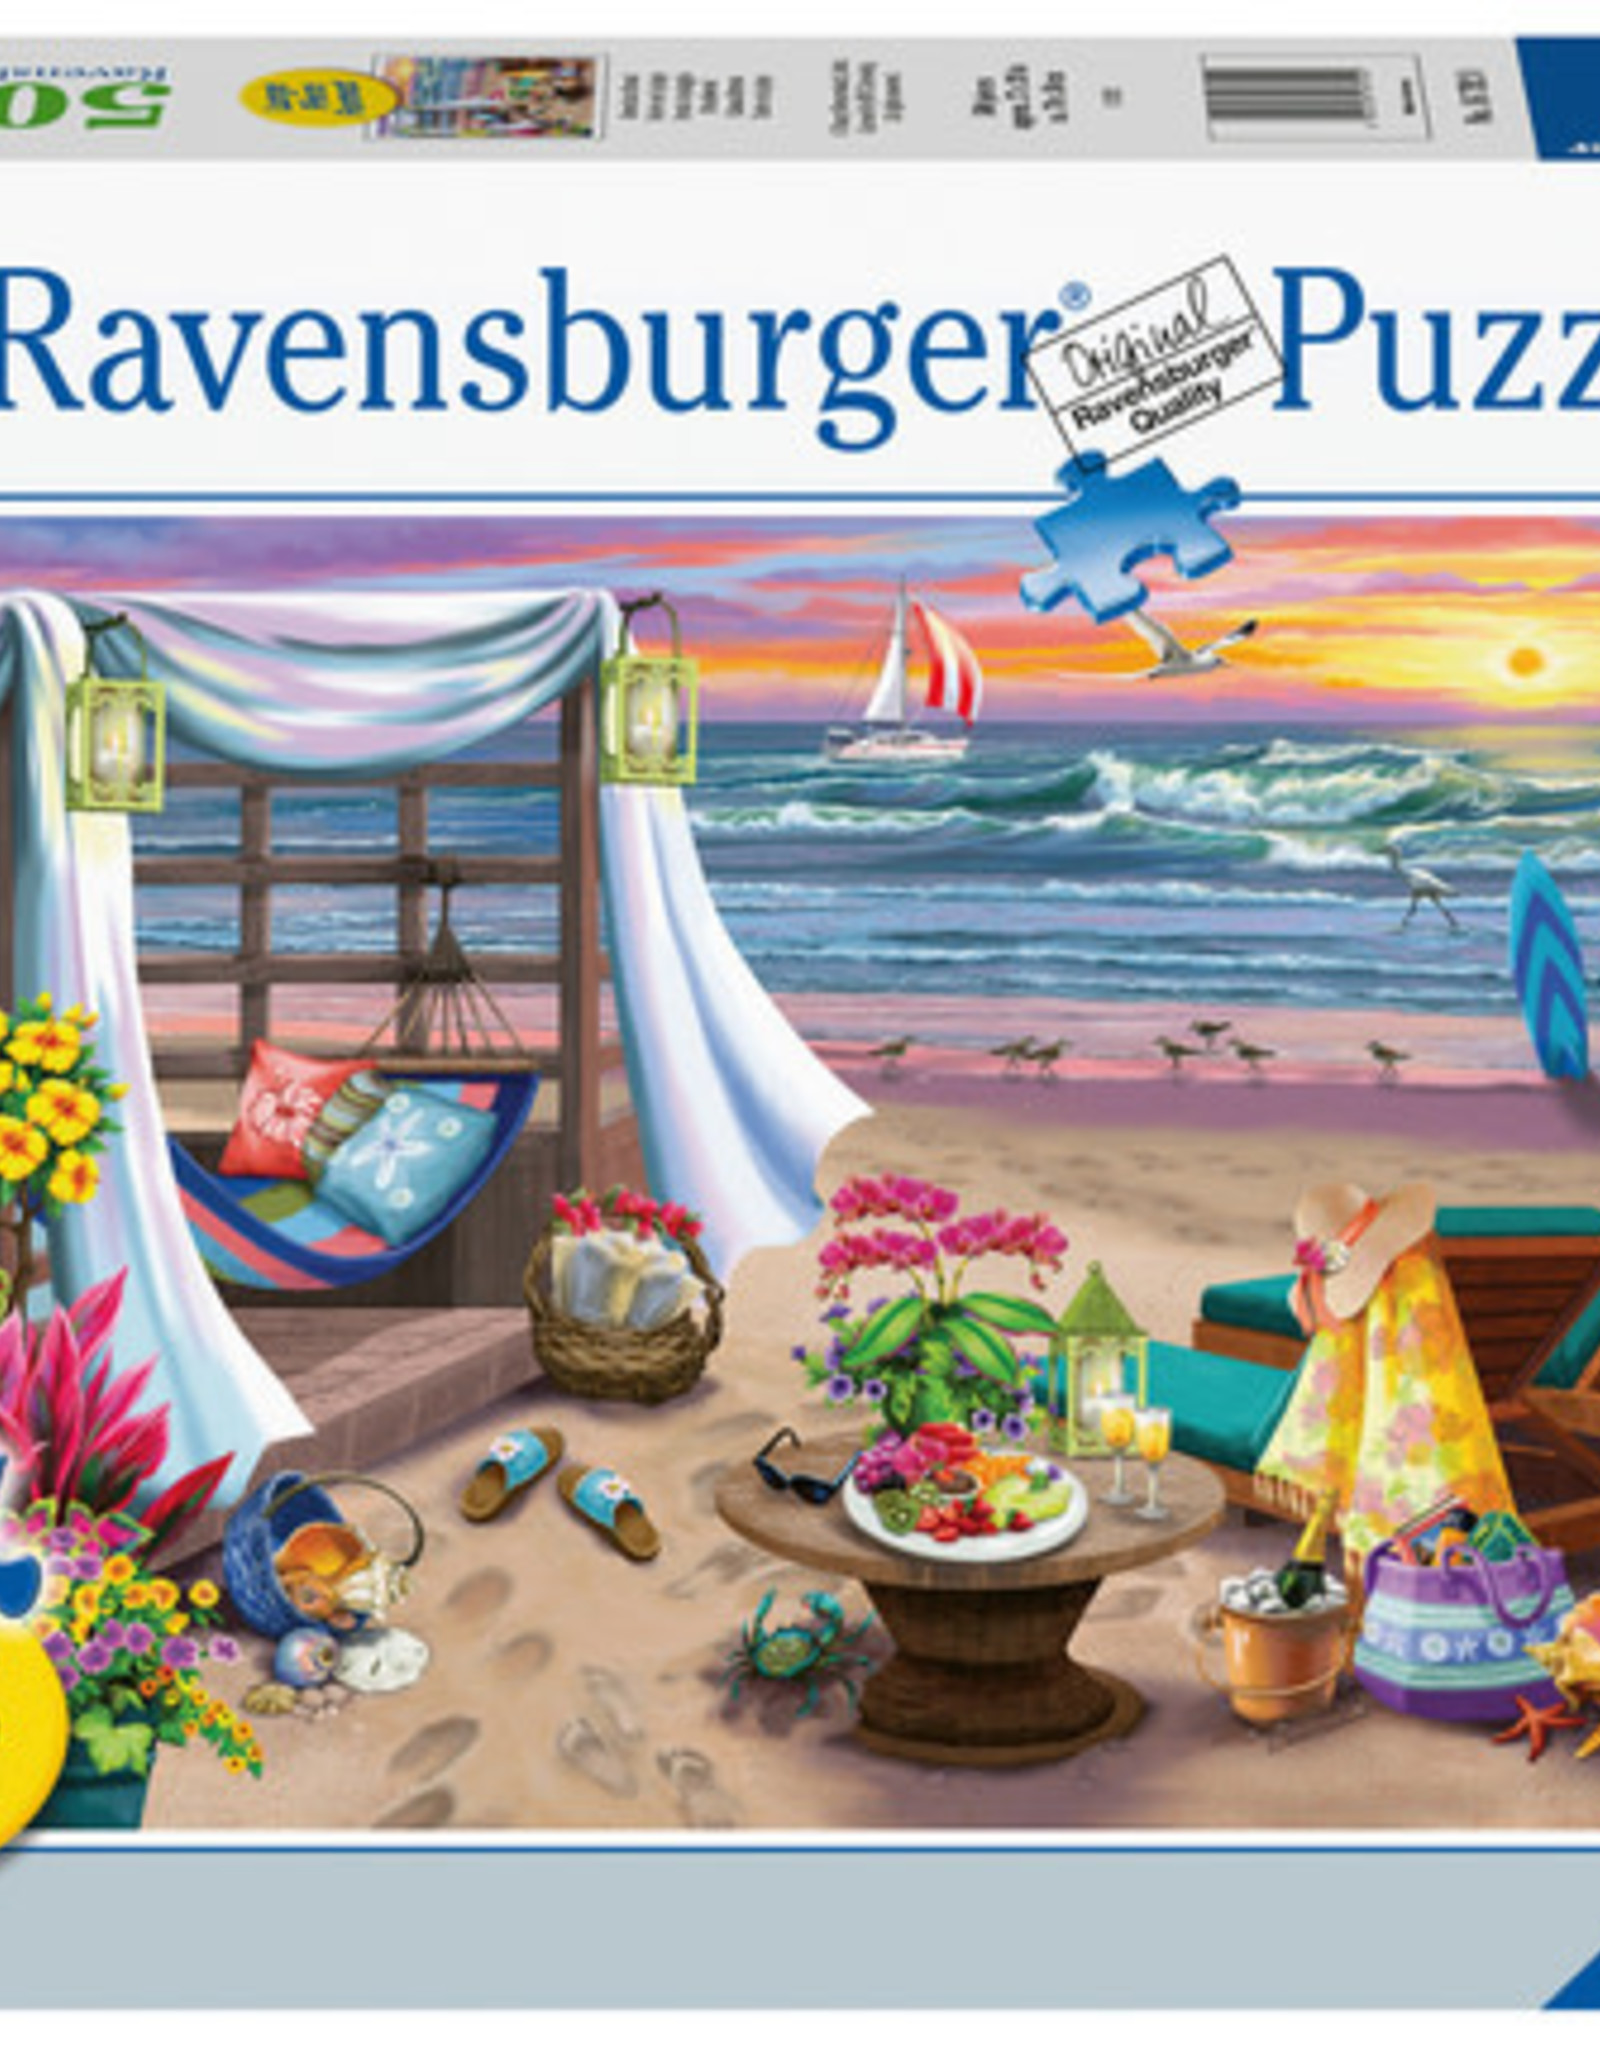 Ravensburger 500pc LF puzzle Cabana Retreat